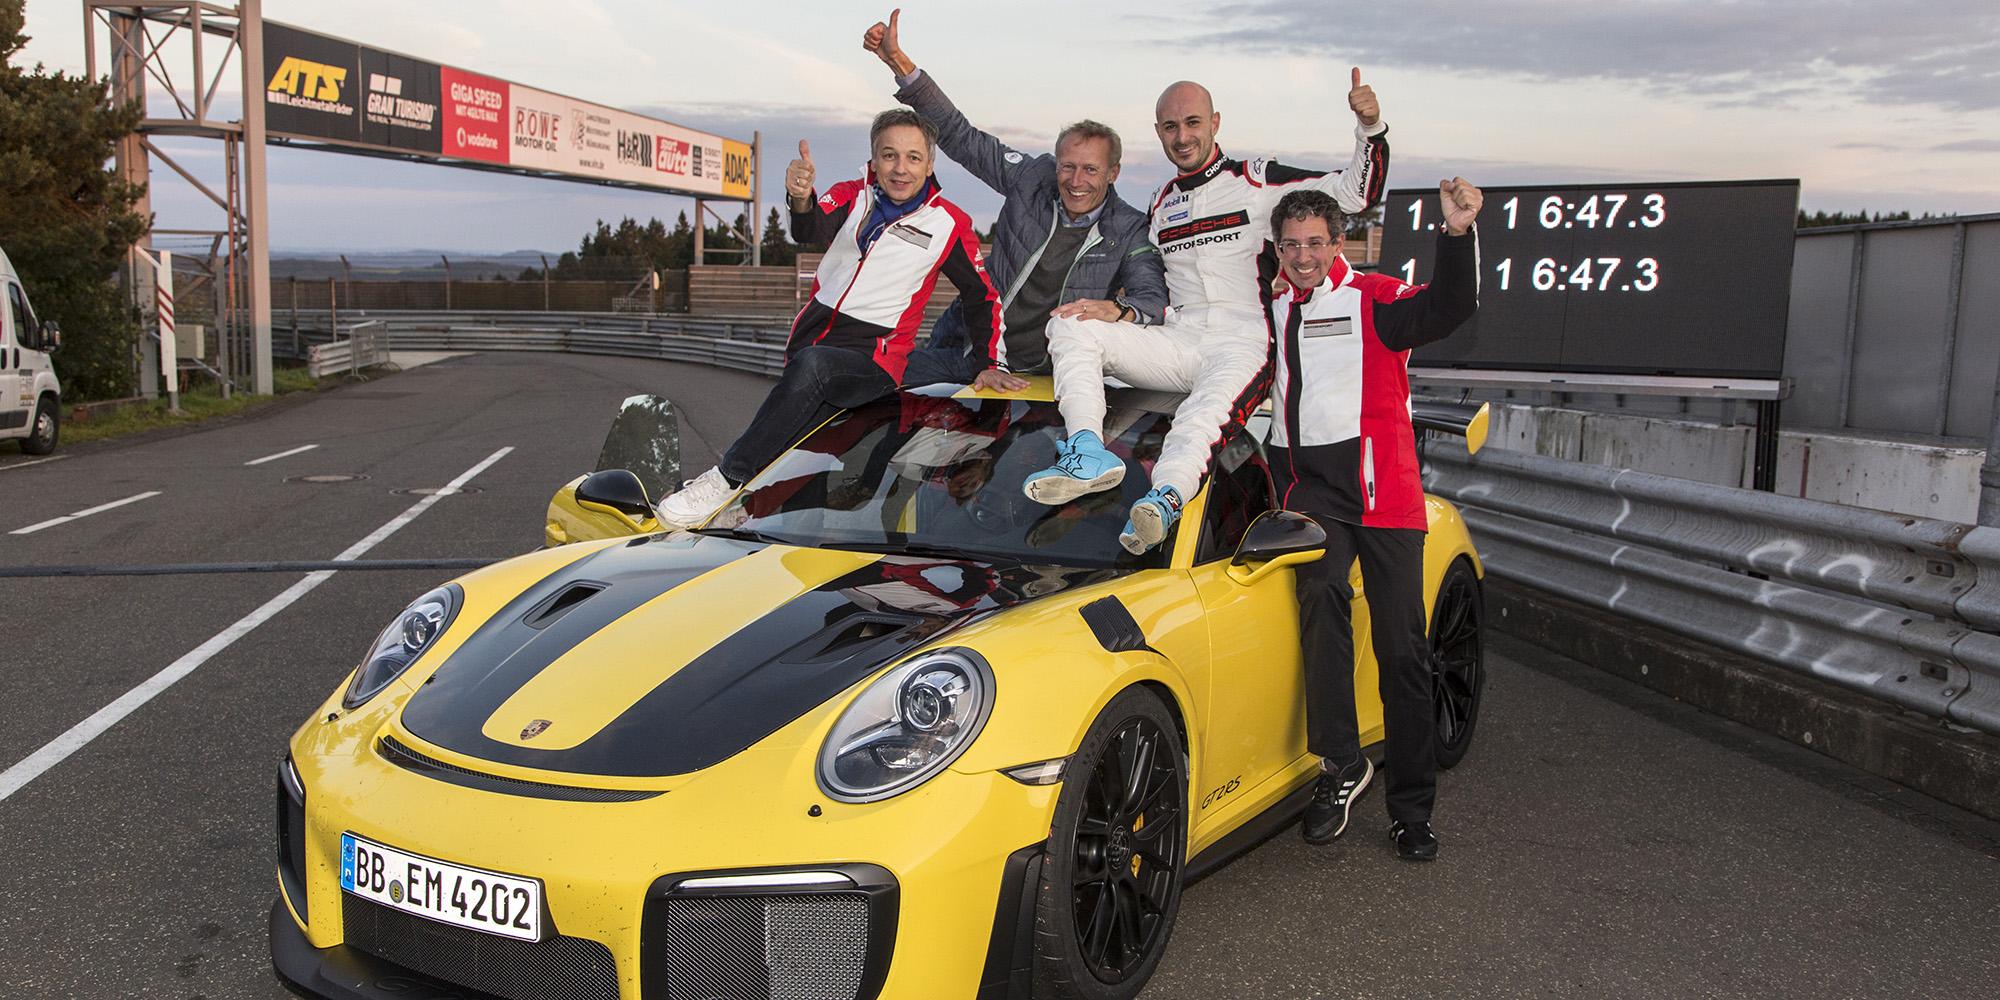 porsche-911-gt2-rs-nurburgring-record-P17_0906_a3_rgb Outstanding Porsche 911 Gt2 Wheel Au Cars Trend